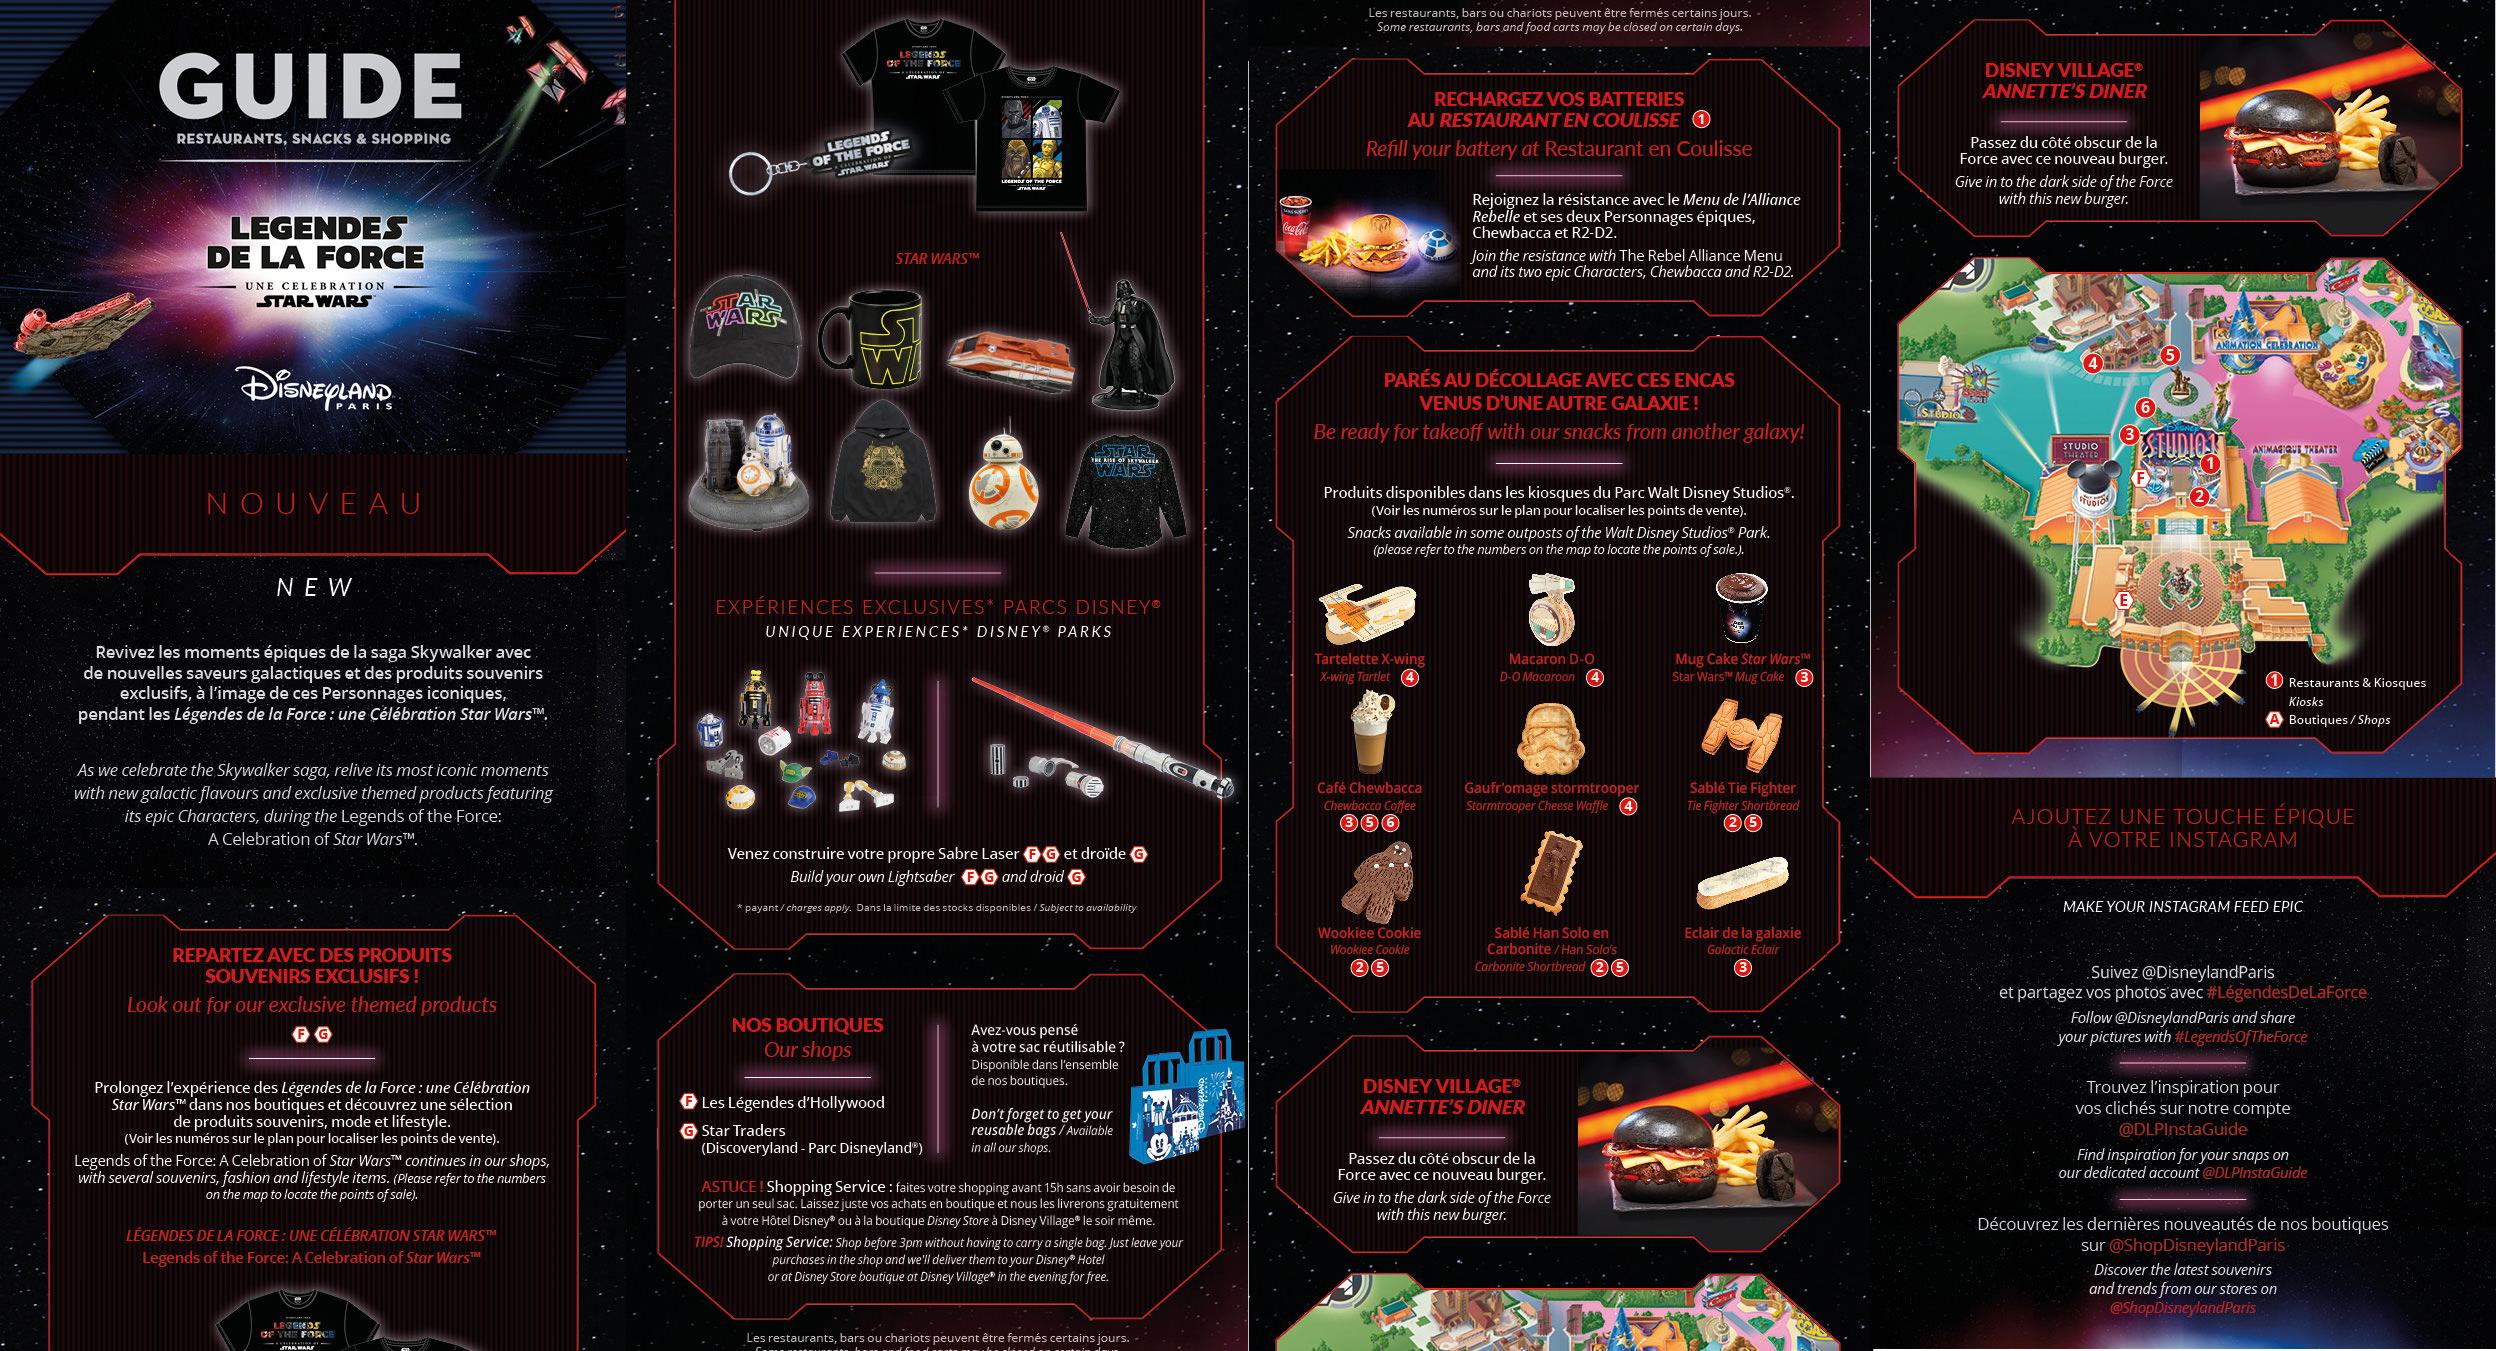 Le guide Food & Shopping Star Wars Disneyland PAris